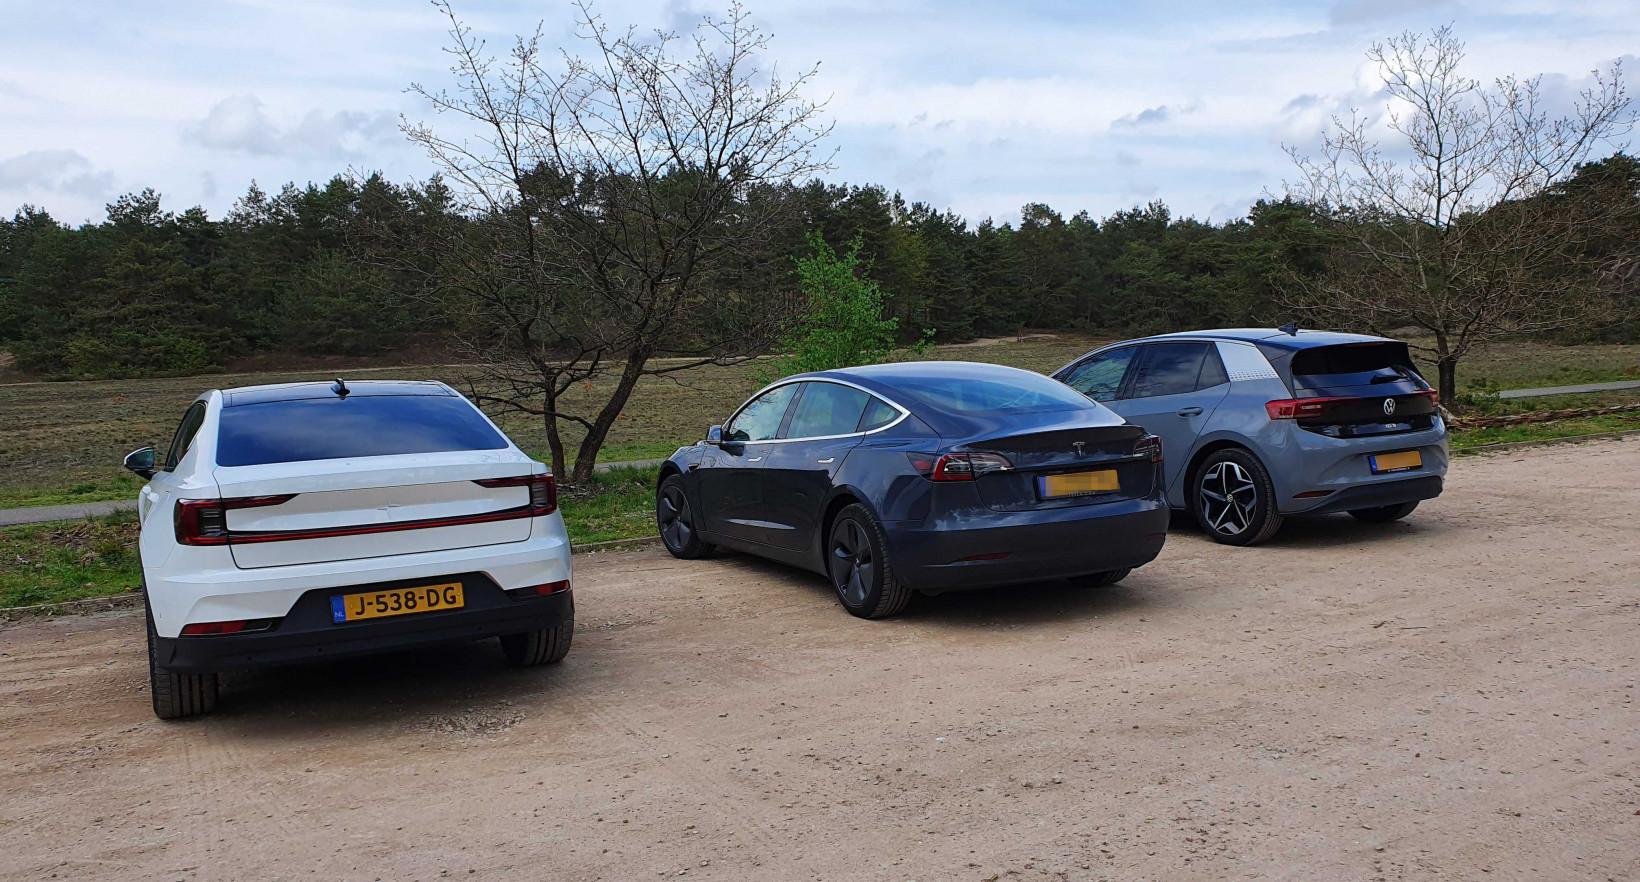 cars, tesla, vw, model 3, ev, future, electric